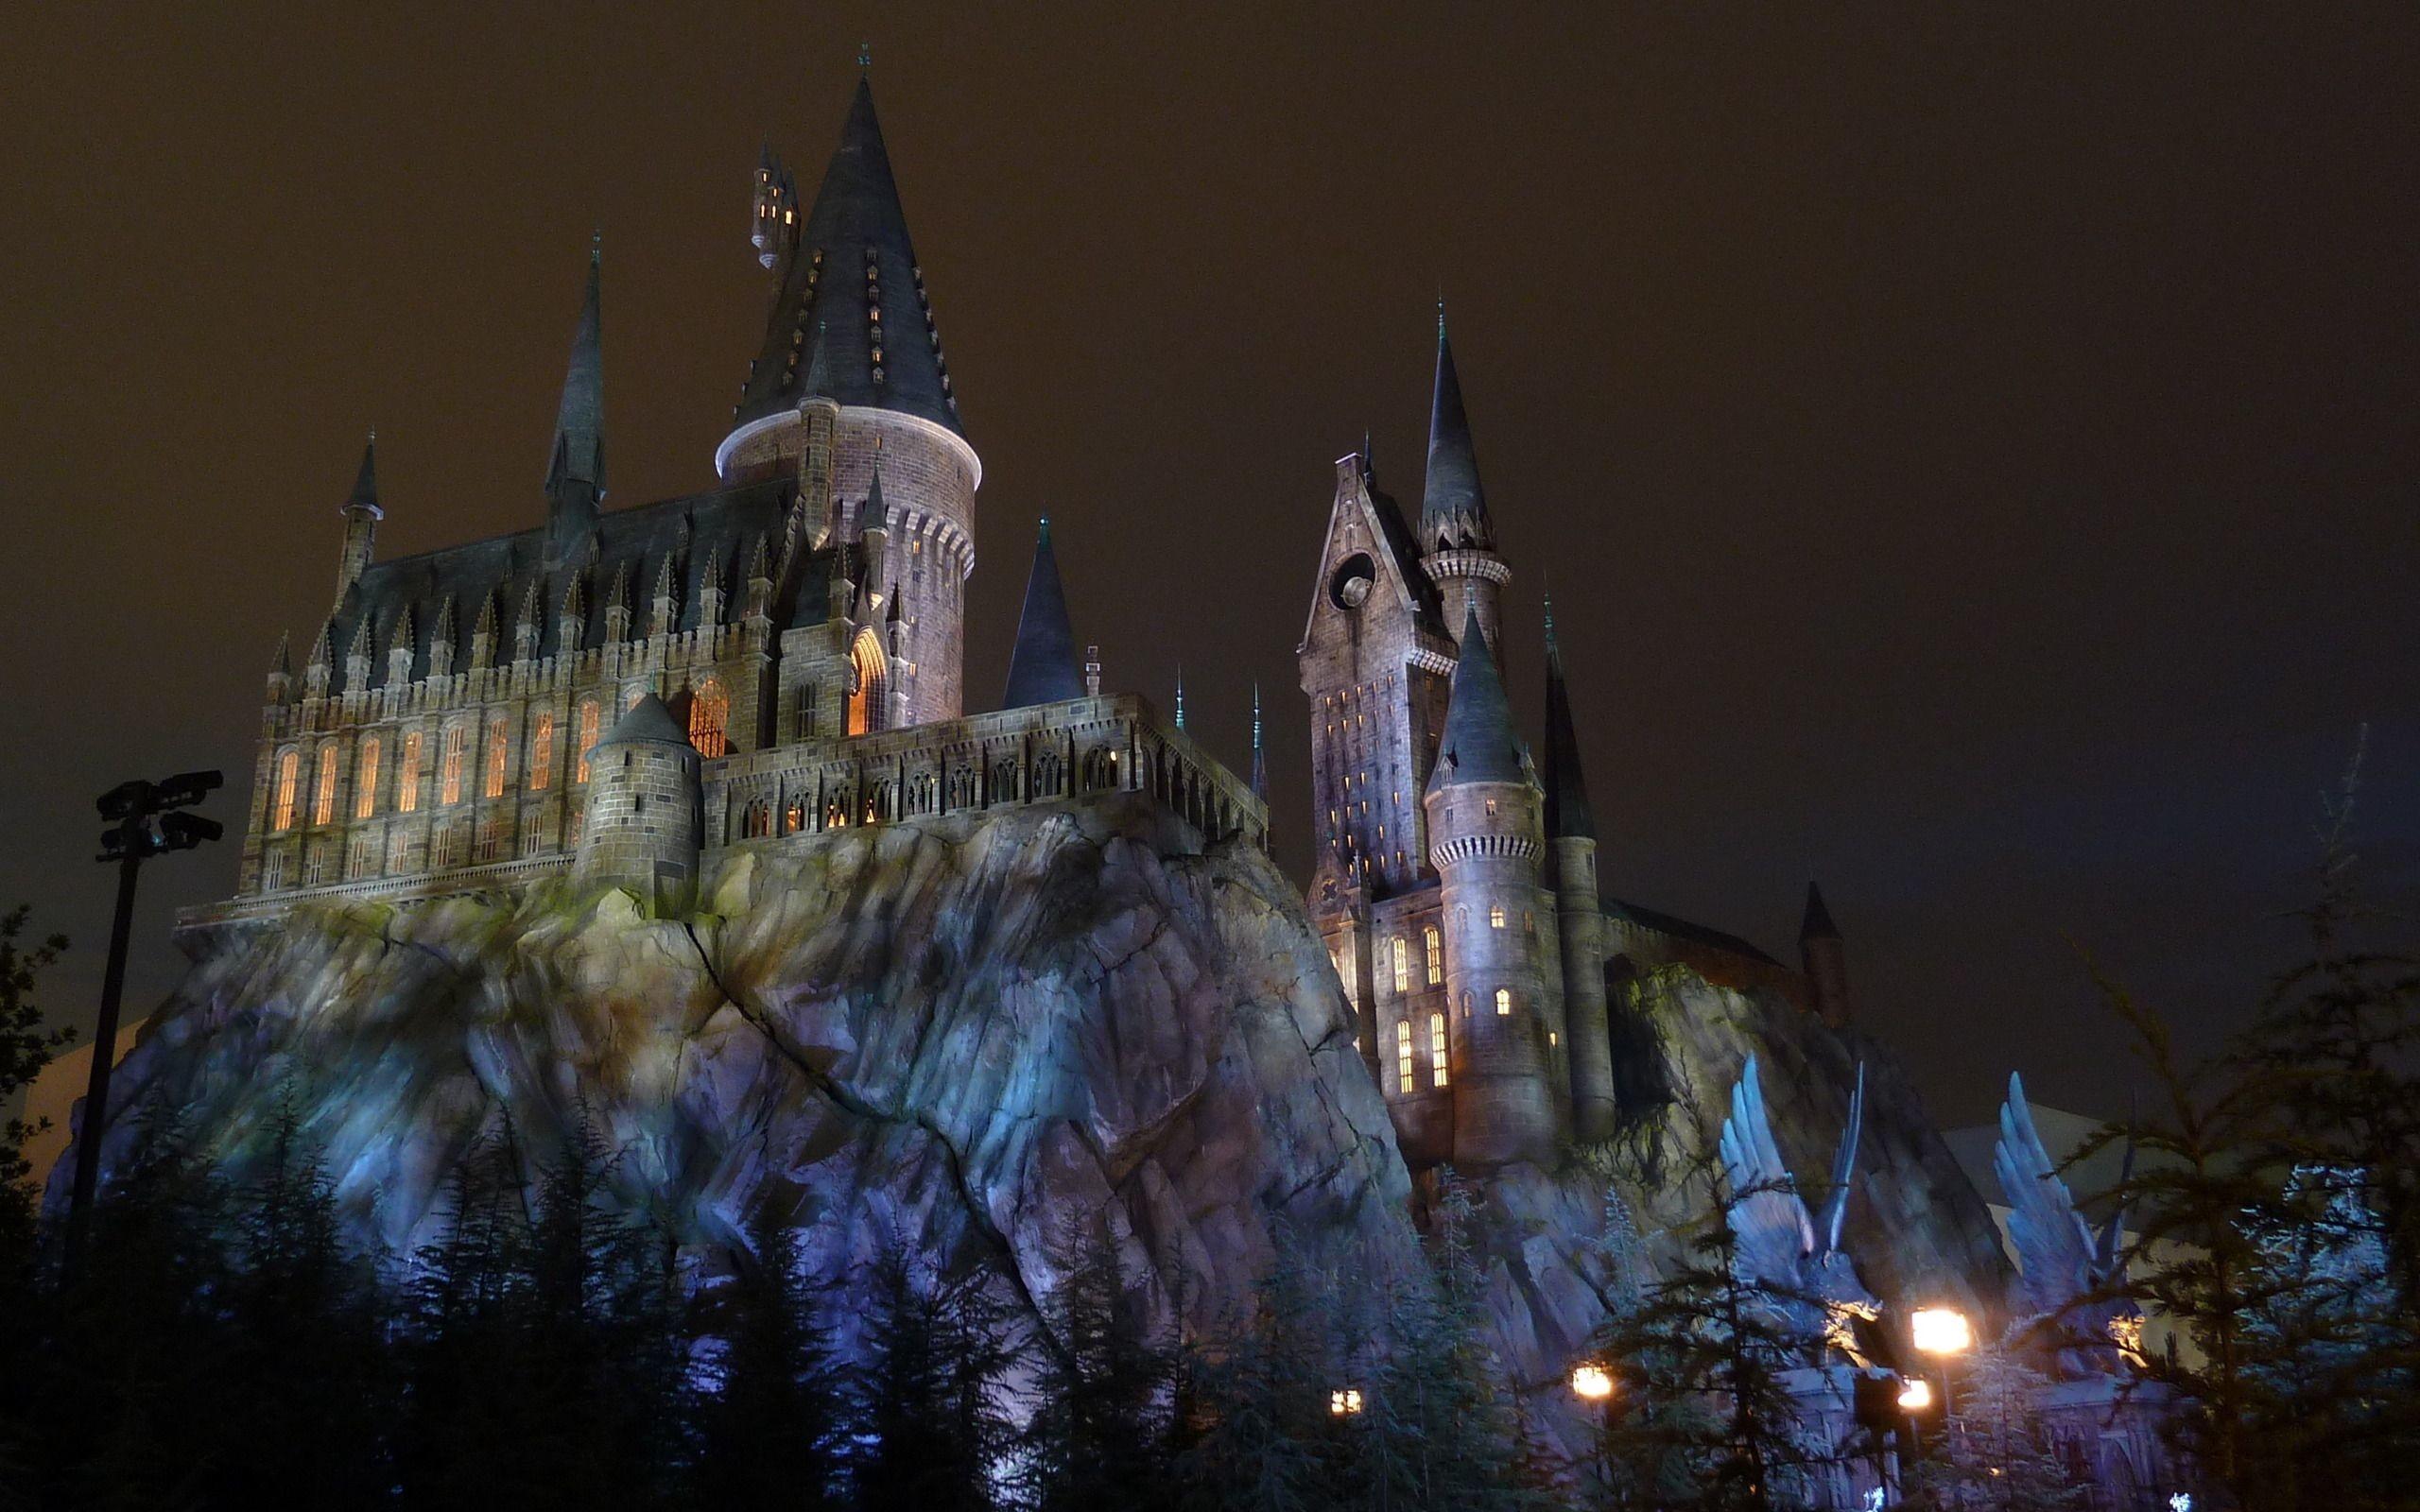 wallpaper.wiki-Hogwarts-Castle-Wallpapers-HD-PIC-WPE003663